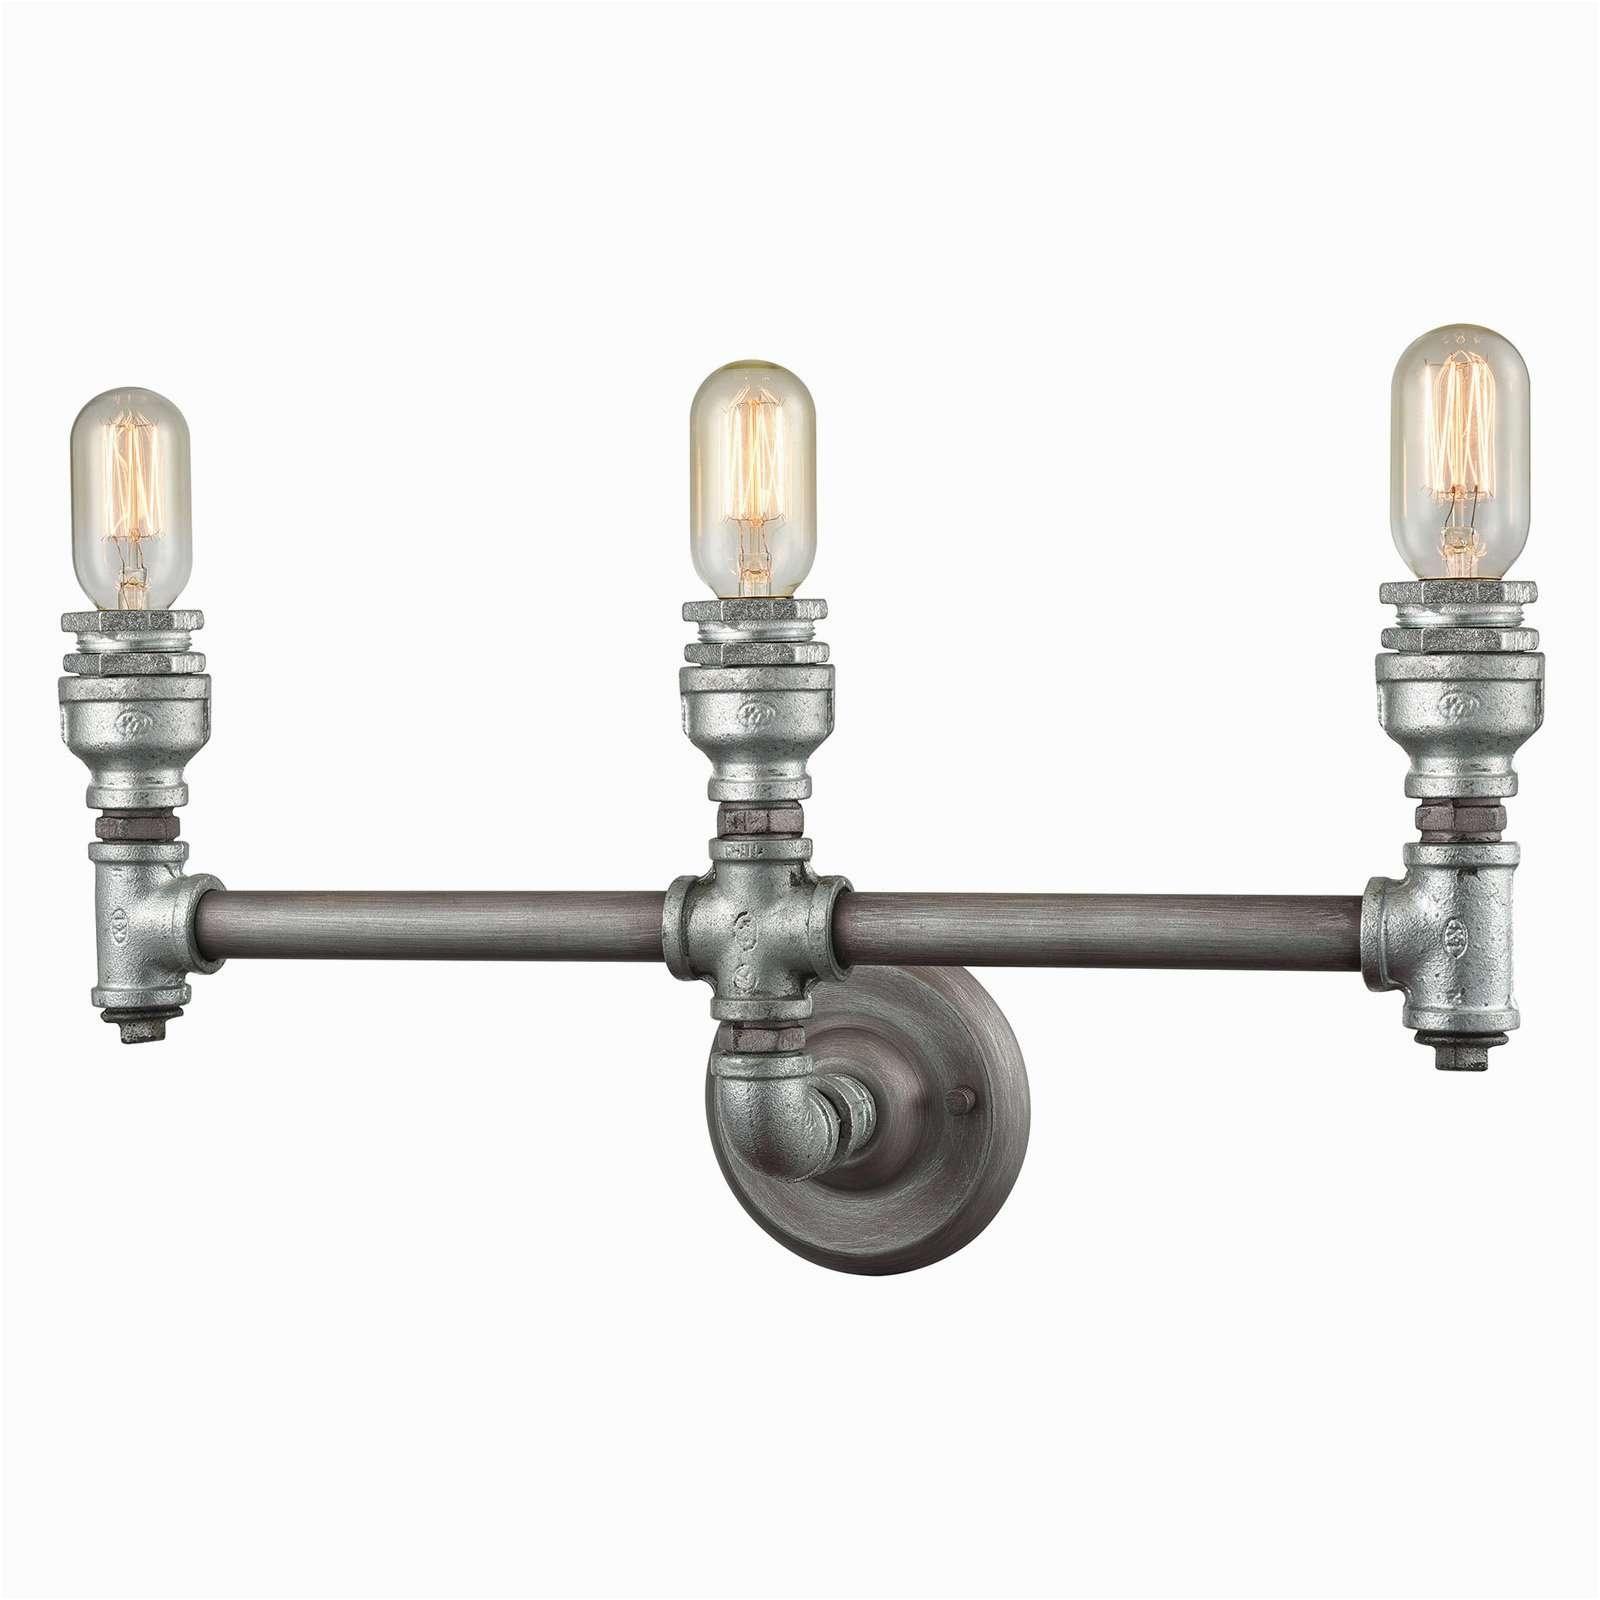 elegant elk lighting cast iron pipe 3 3 light bathroom vanity light inspirational